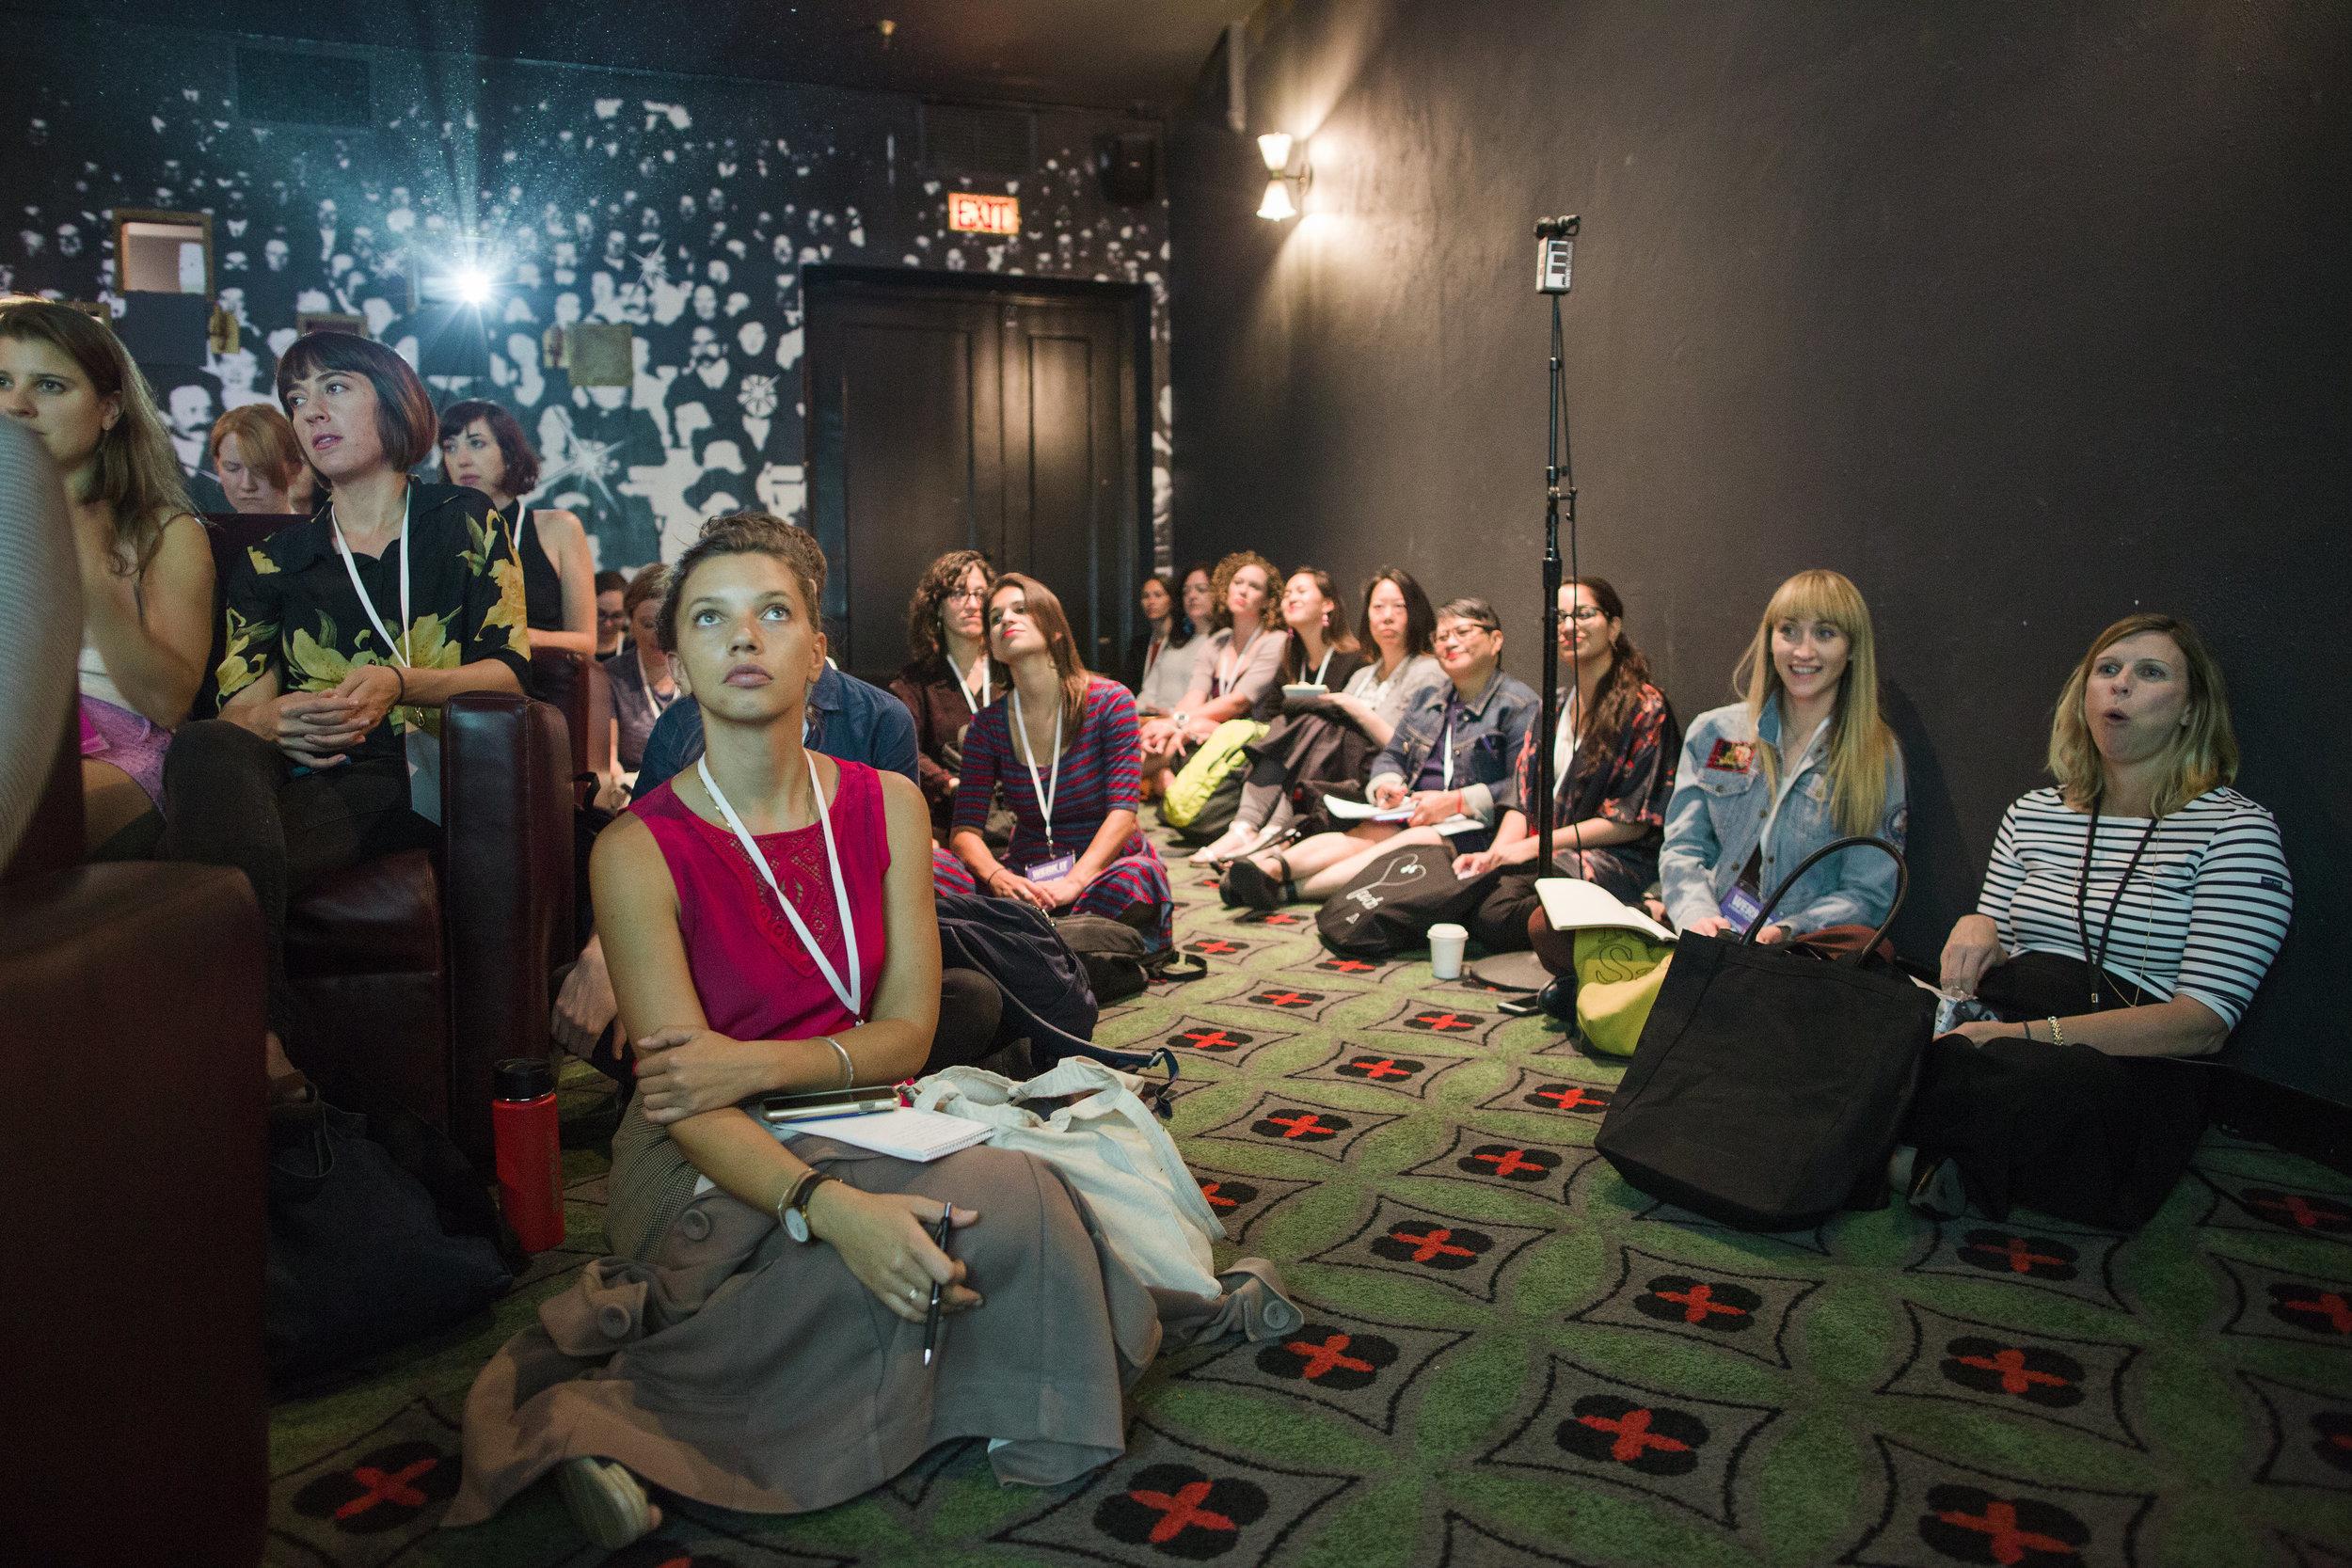 Audience members watching a presentation